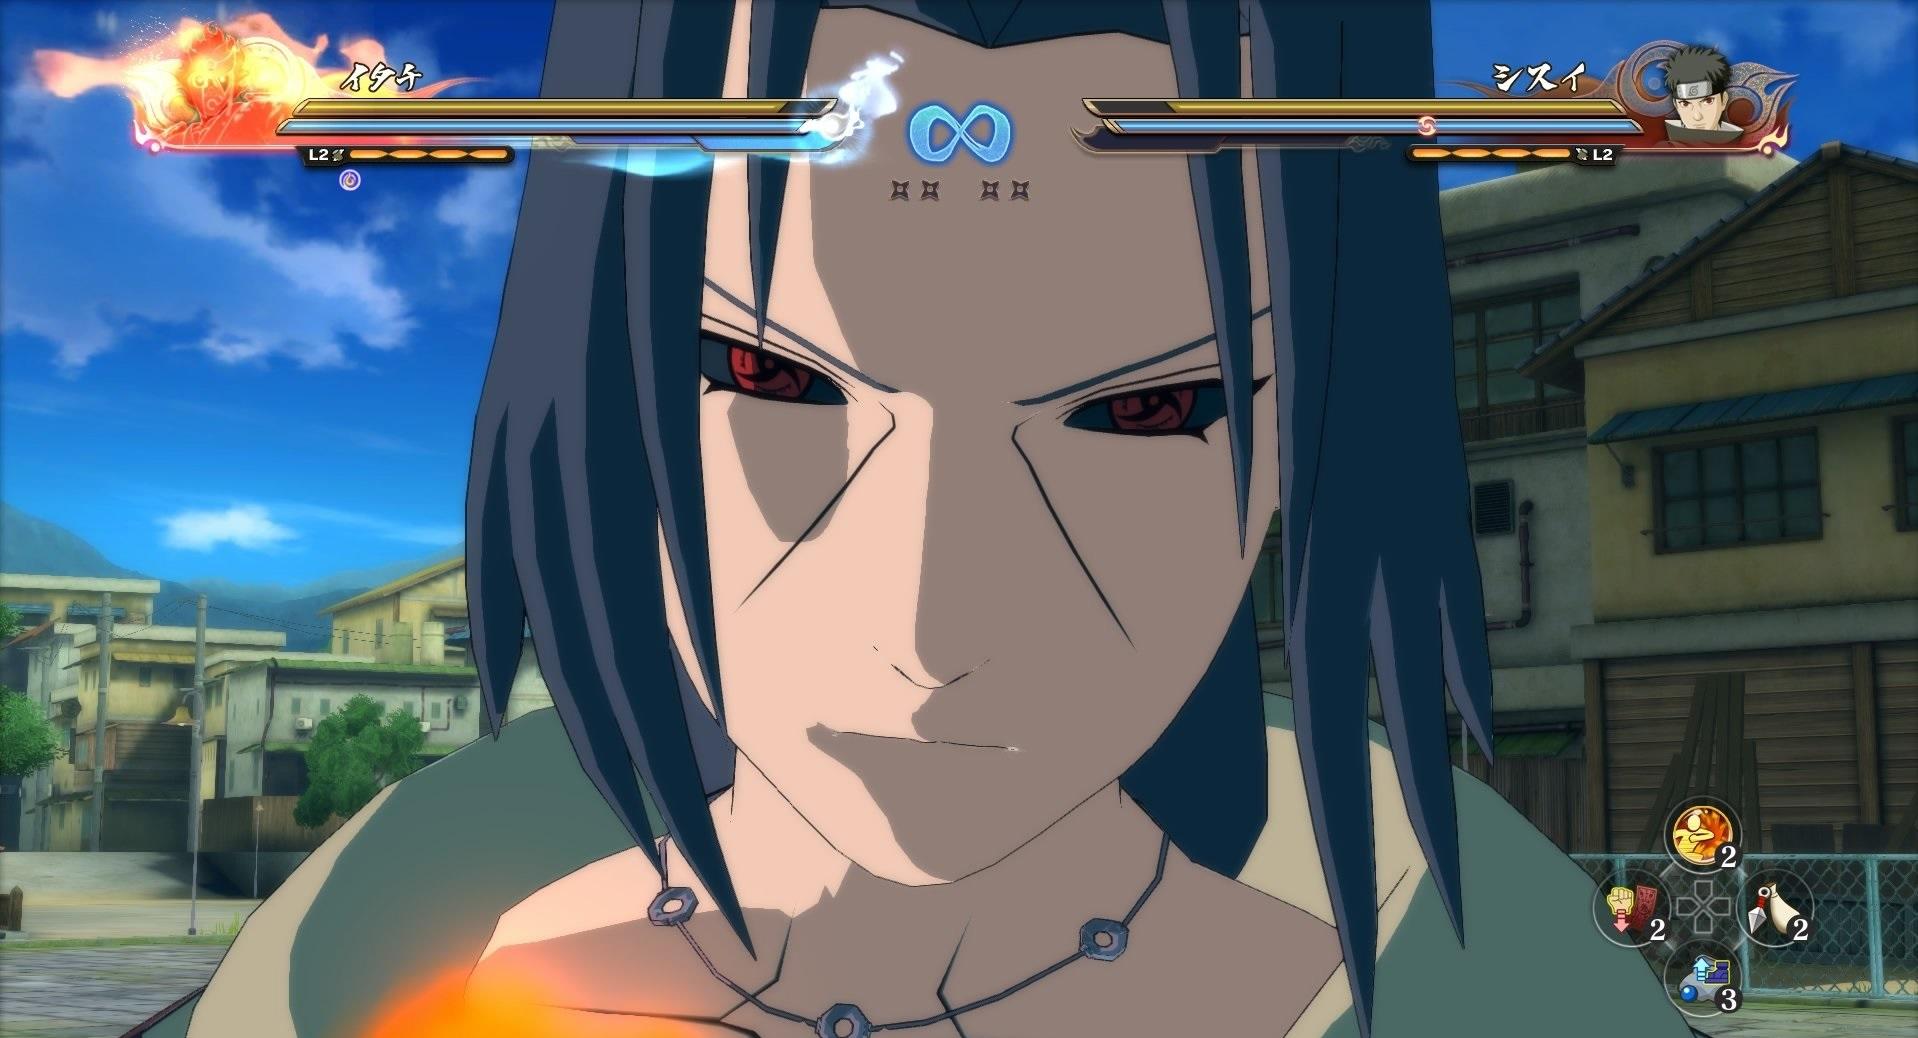 Naruto-Storm-4-2 Naruto Storm 4:Mükemmel Susanoo Shisui ve Itachi Ekran Görüntüleri